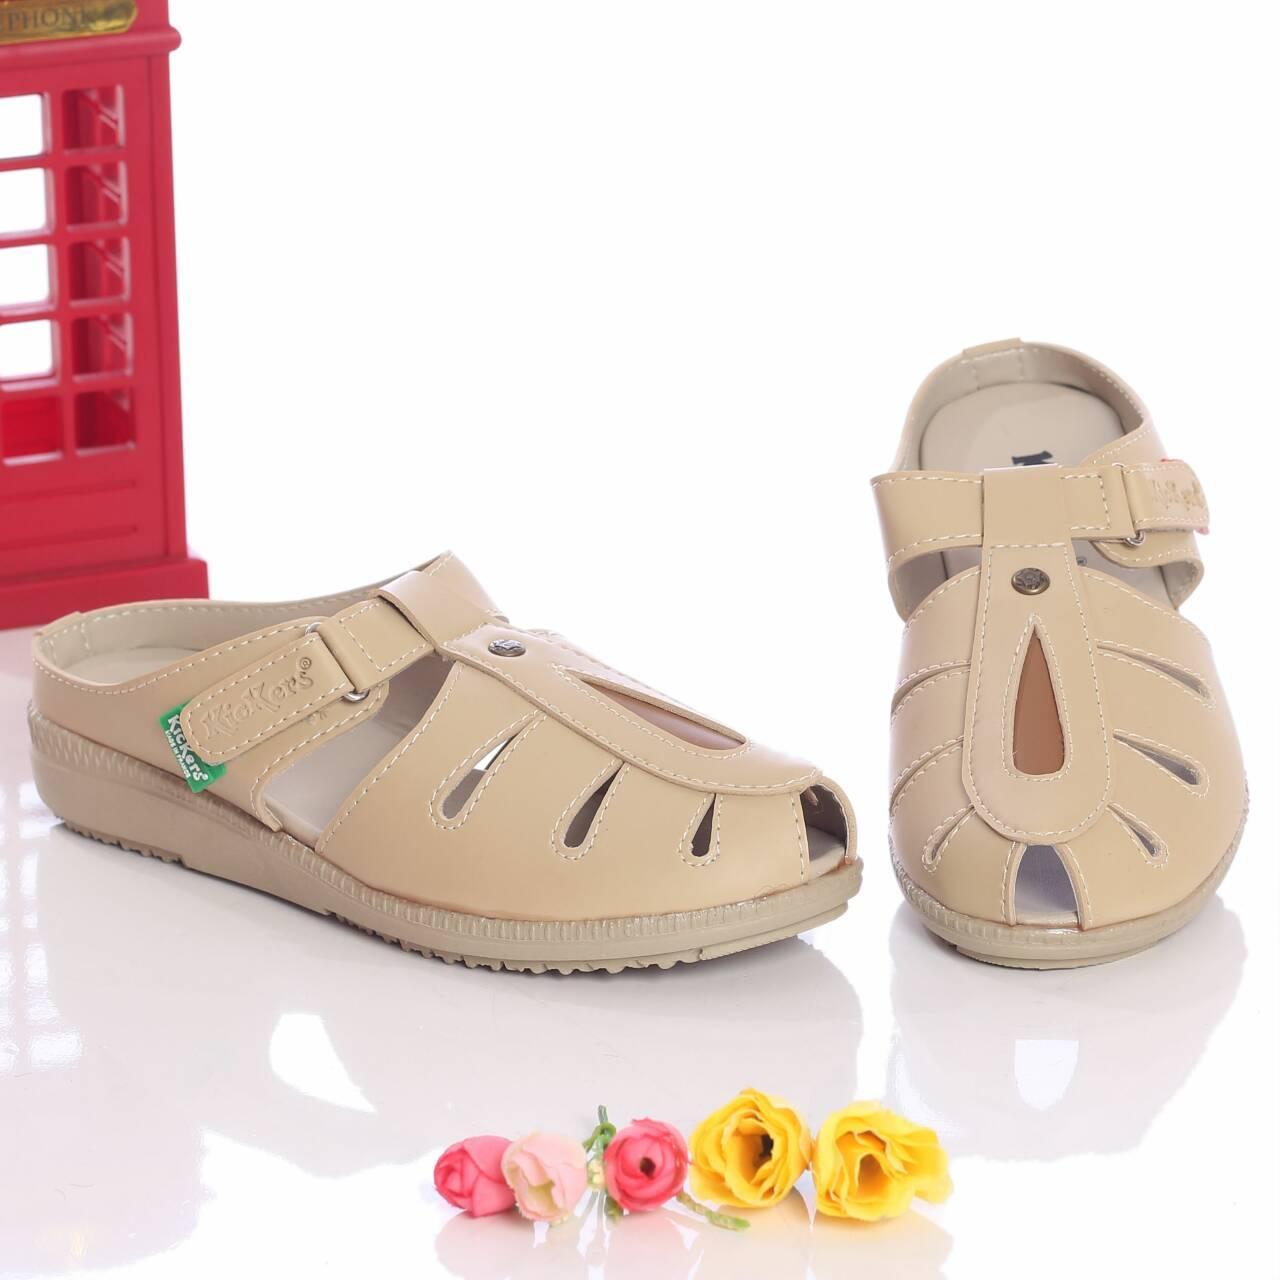 Garsel L620 Sepatu Formal Kerja Heels Wanita Kulit Premium Menawan Mikaela High Shoes Des Mestizo Kaiser Hitam